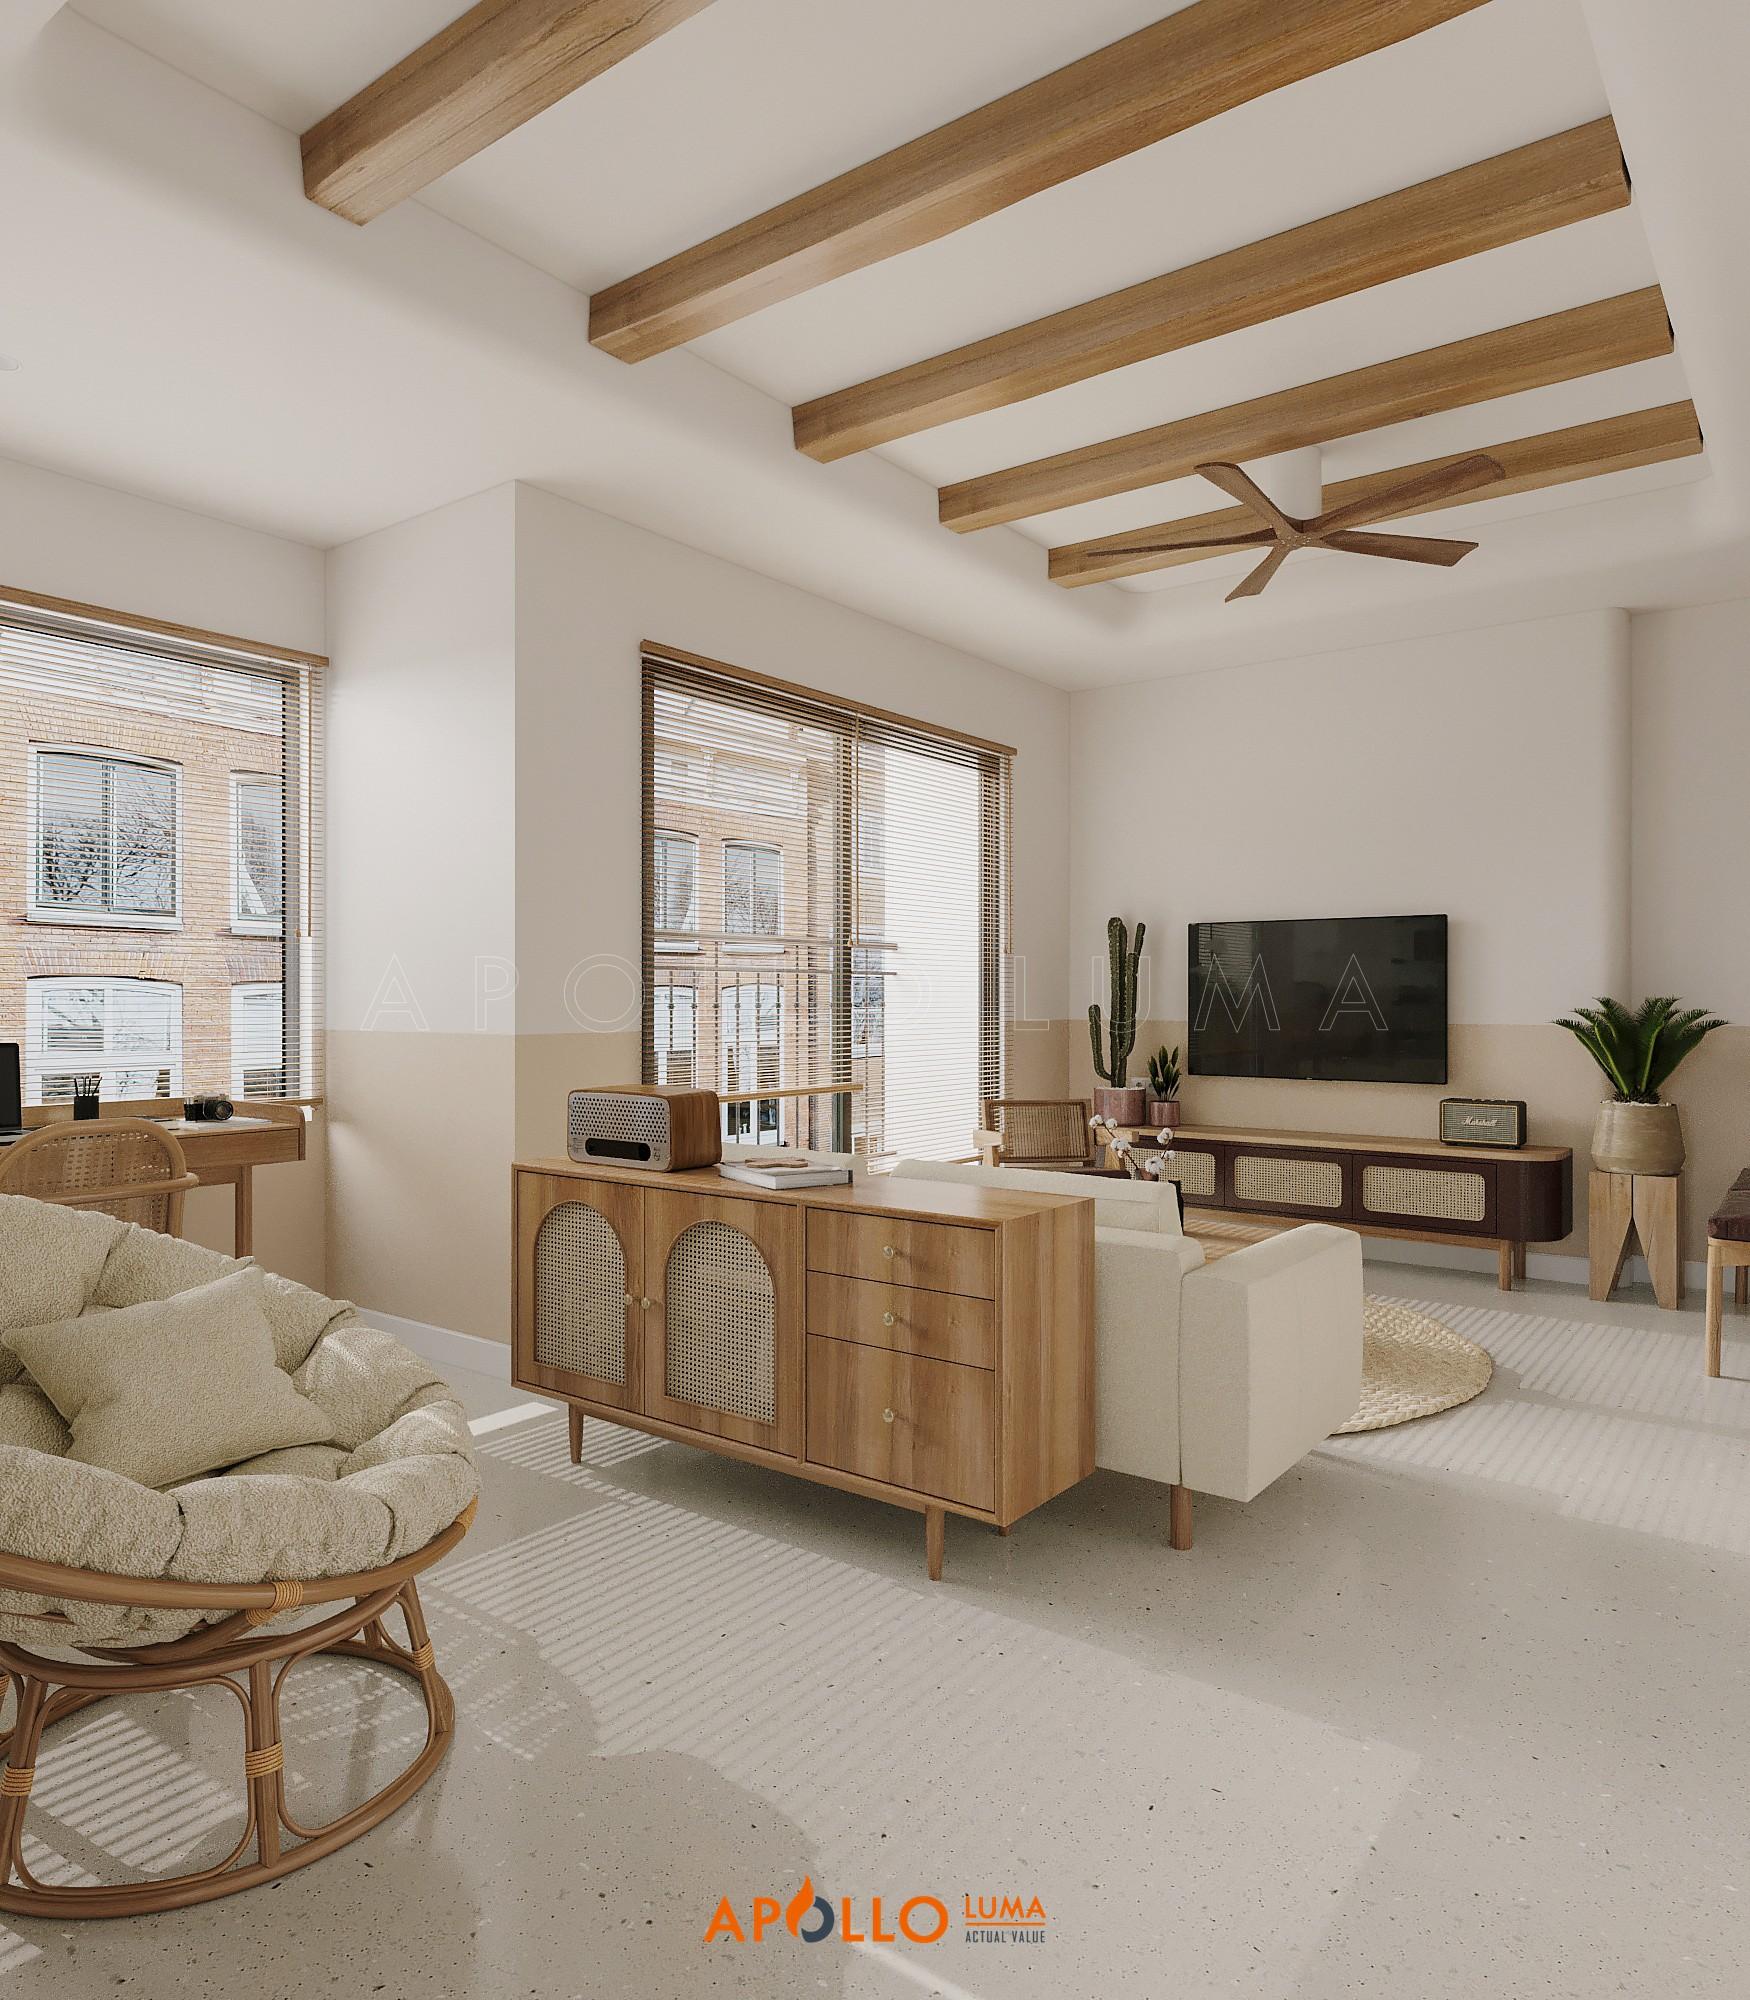 Thiết kế nội thất căn 2PN+1 (65m2) S2.03-26 Vinhomes Ocean Park